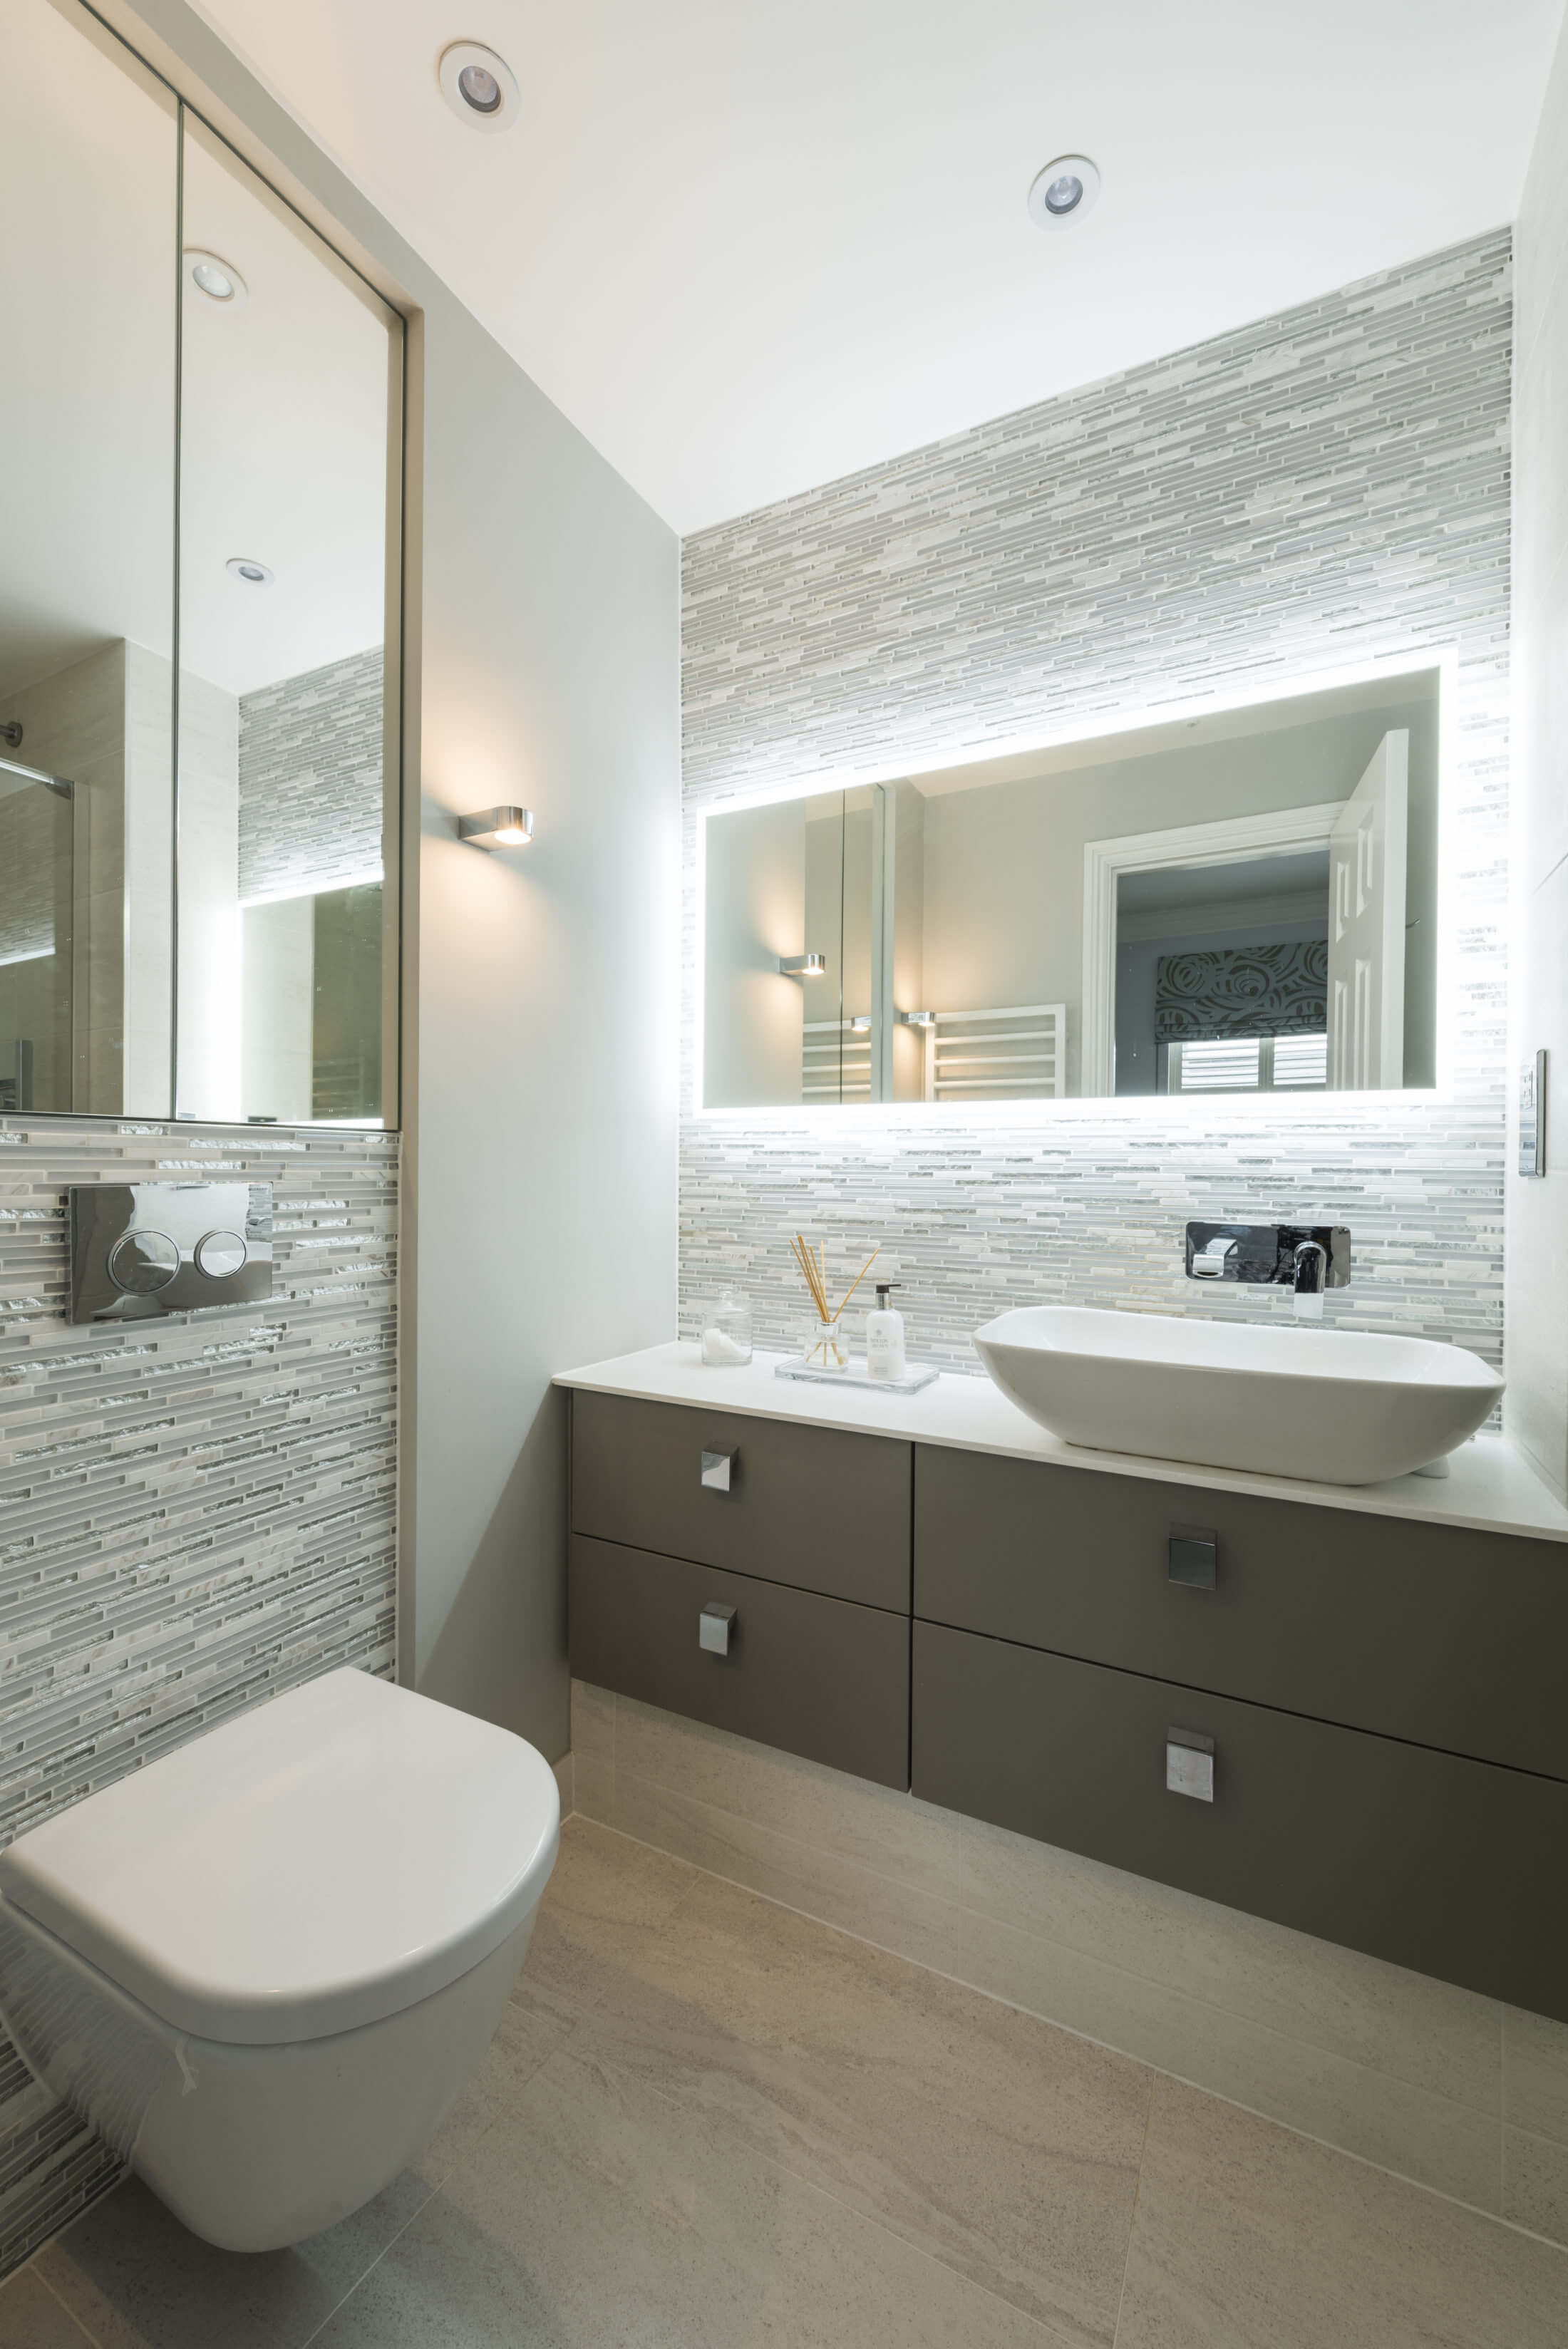 Bathroom inspiration for your luxury bathroom in Long Ditton, Surrey